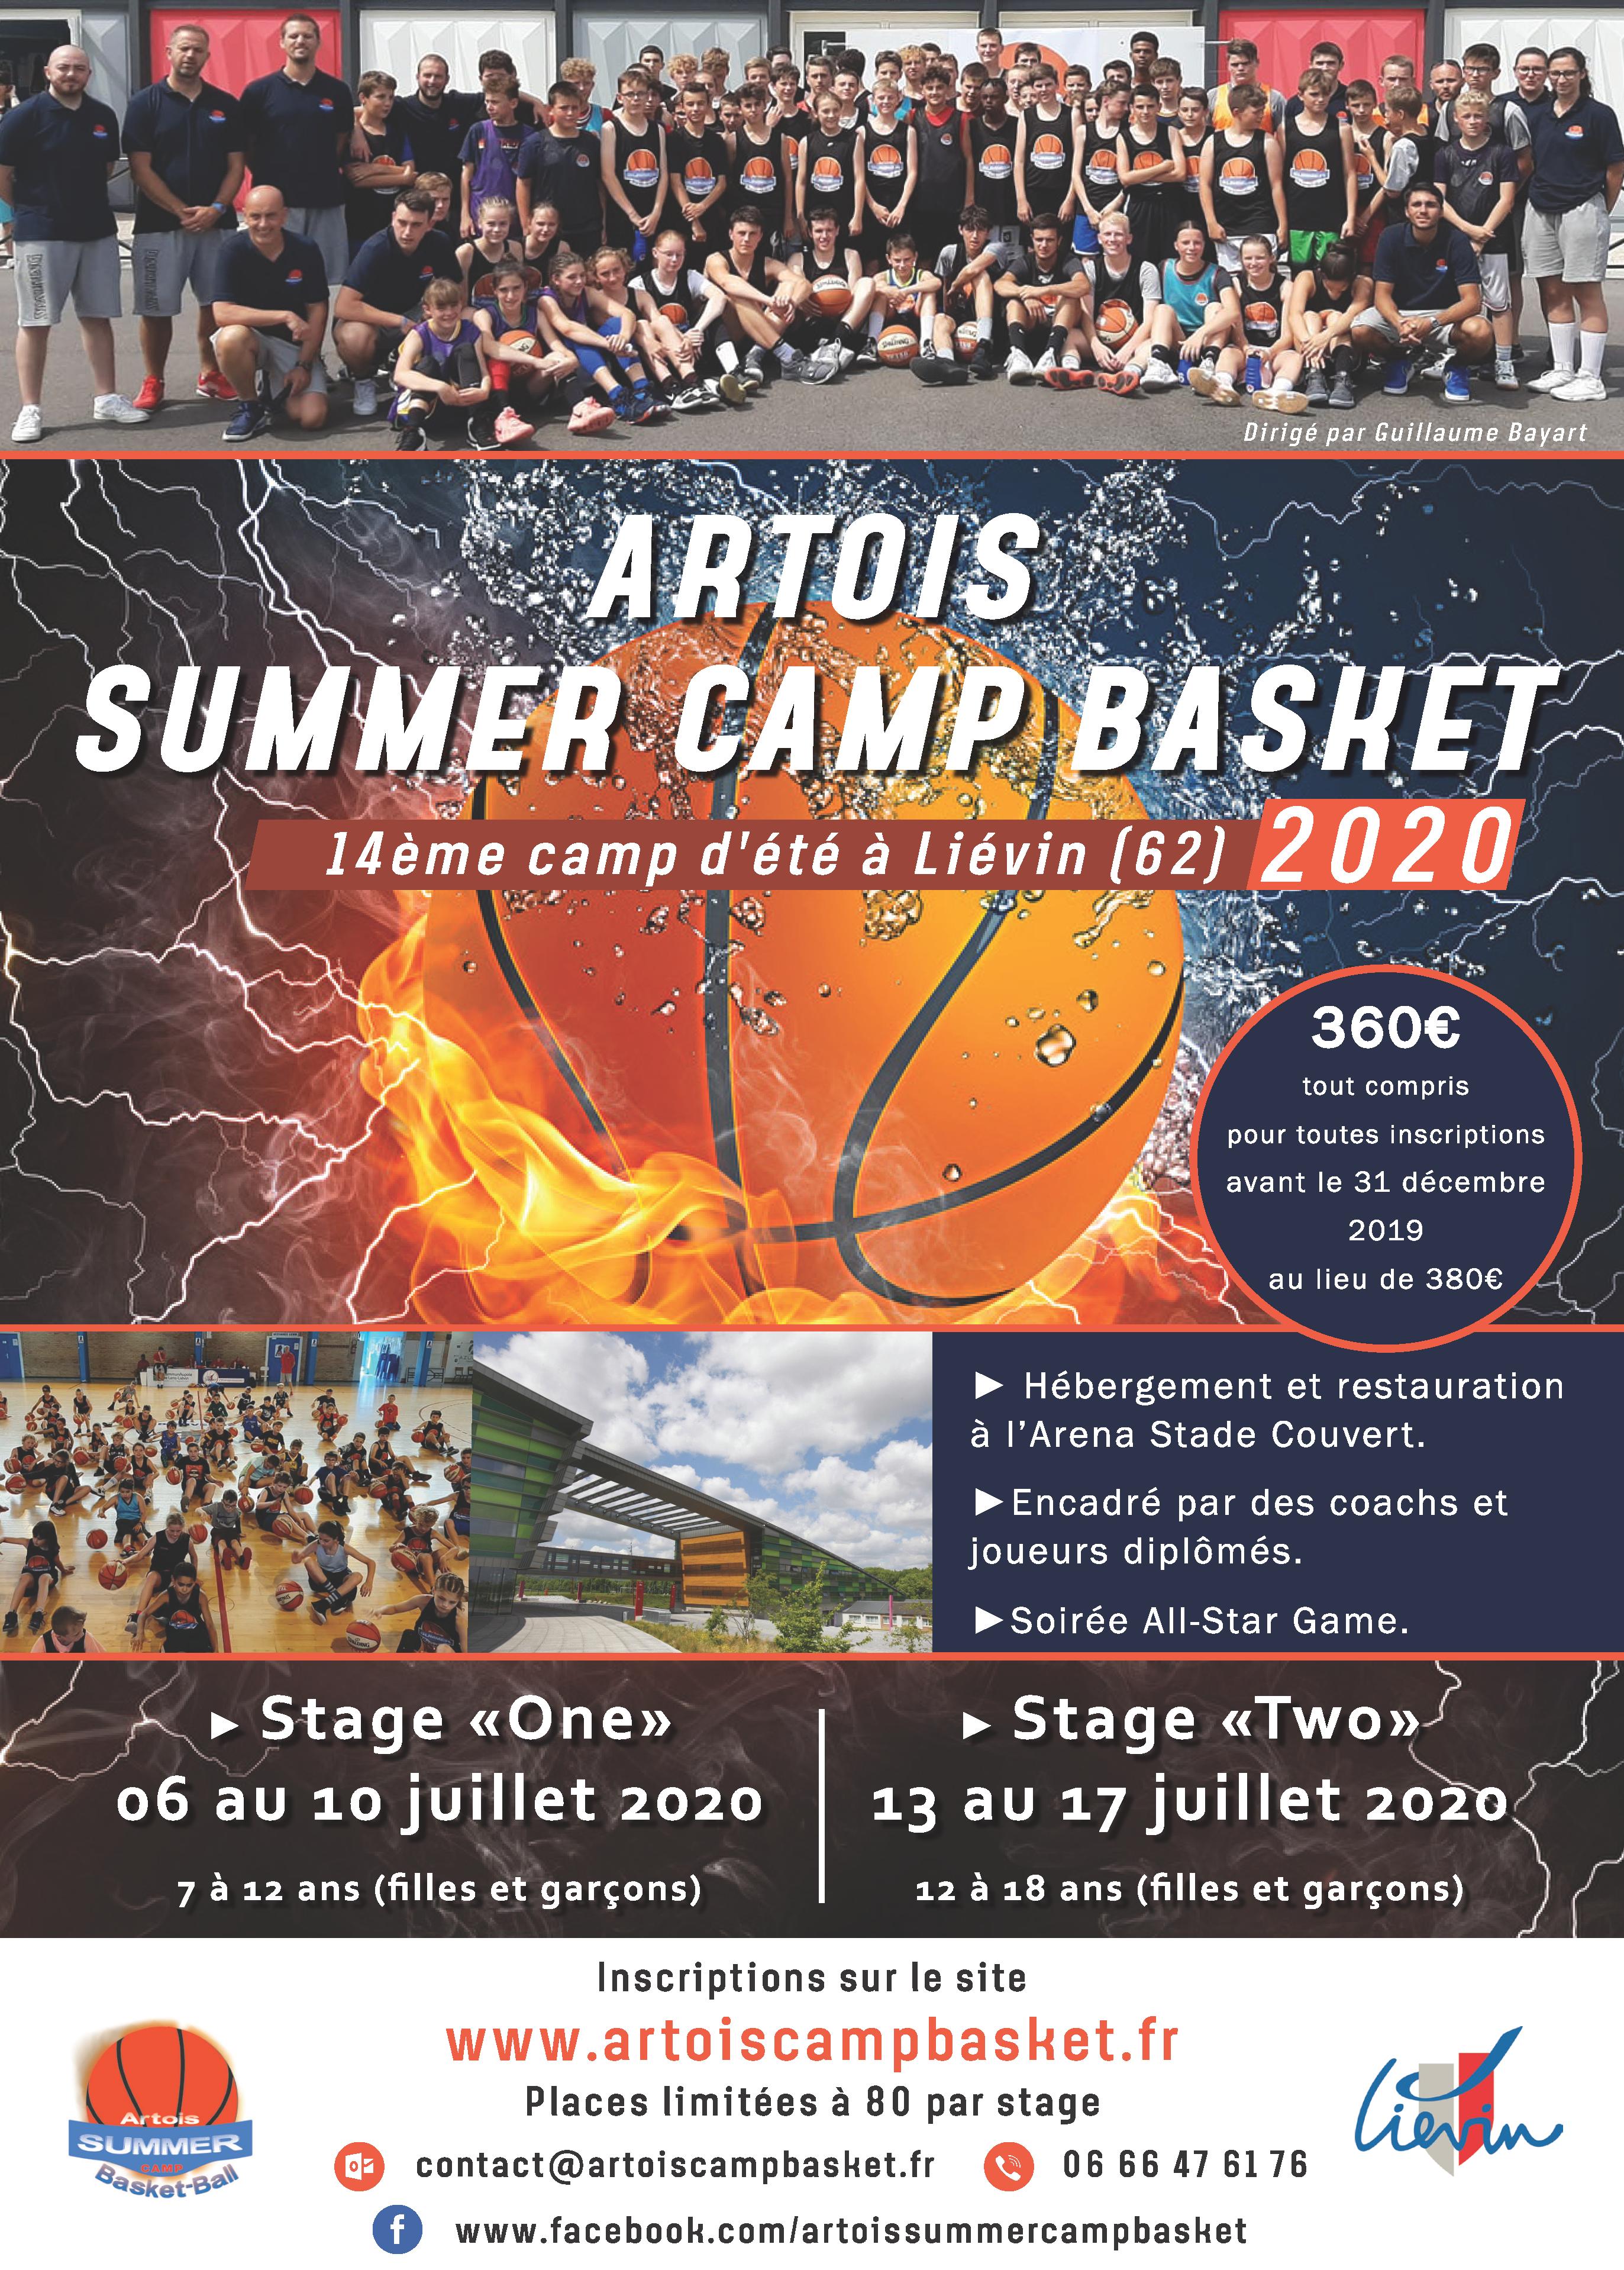 Artois Summer Camp Basket – de 7 à 12 ans